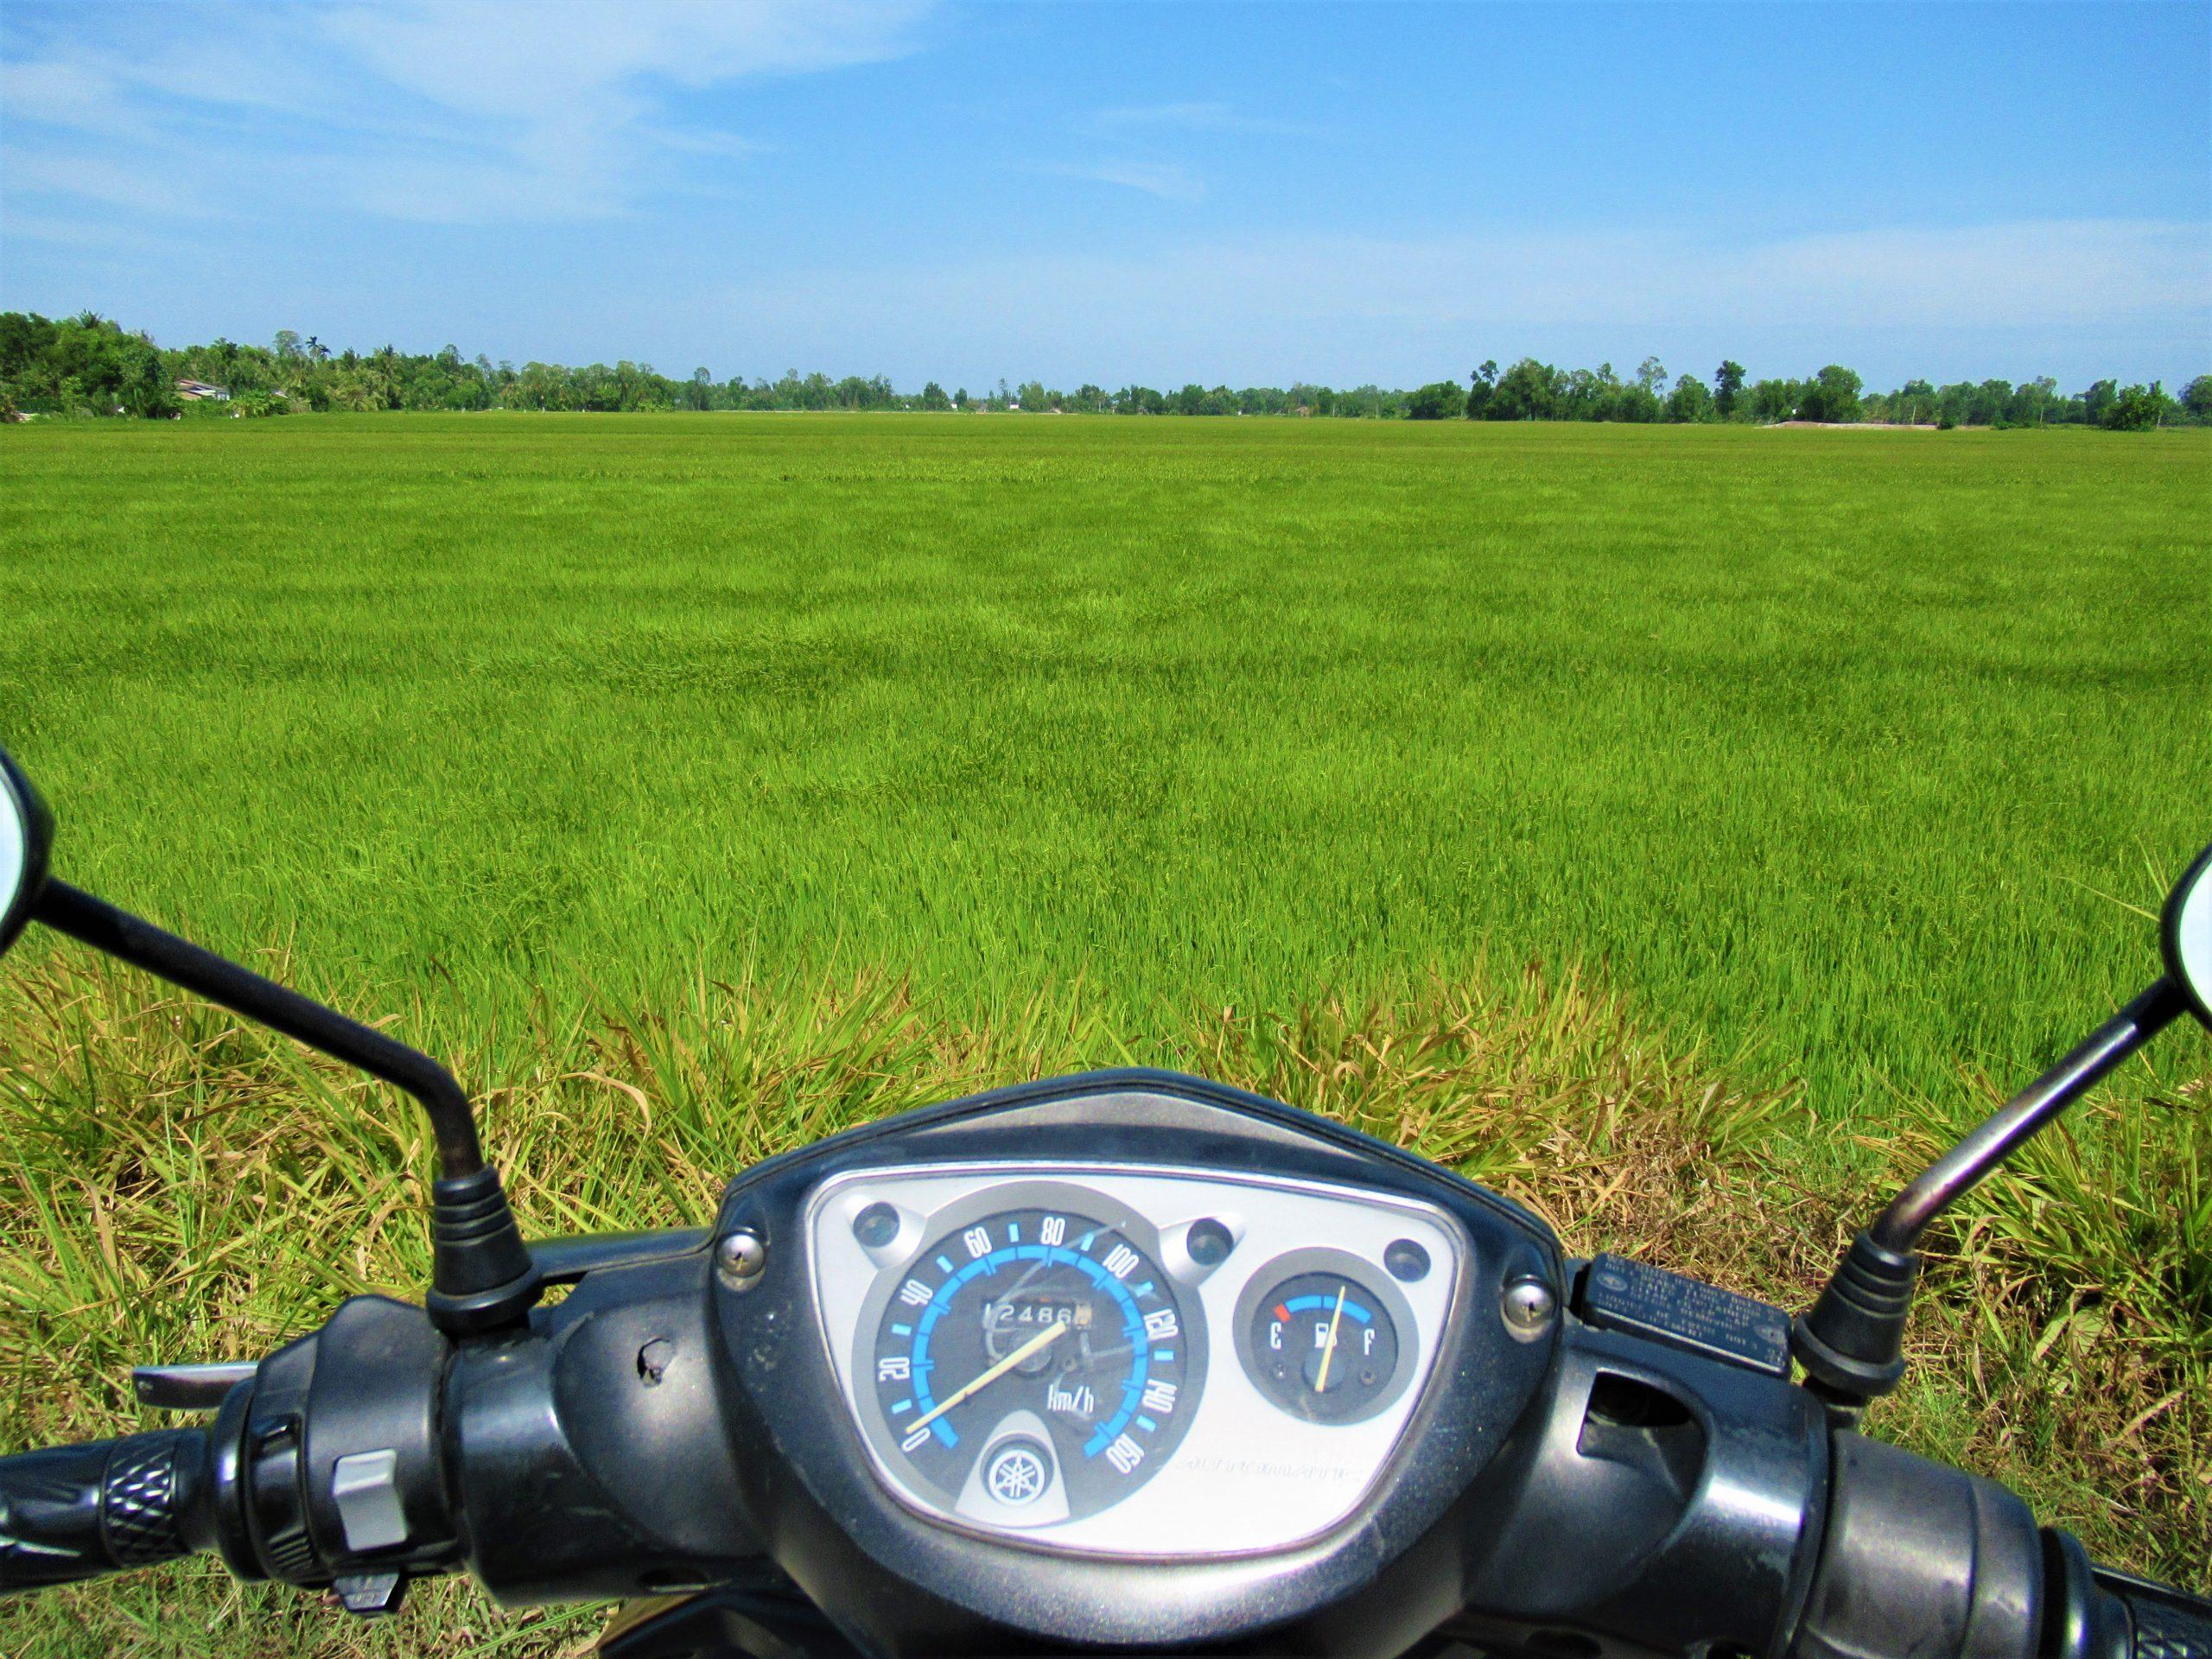 Rice fields, Tra Vinh Province, Mekong Delta, Vietnam